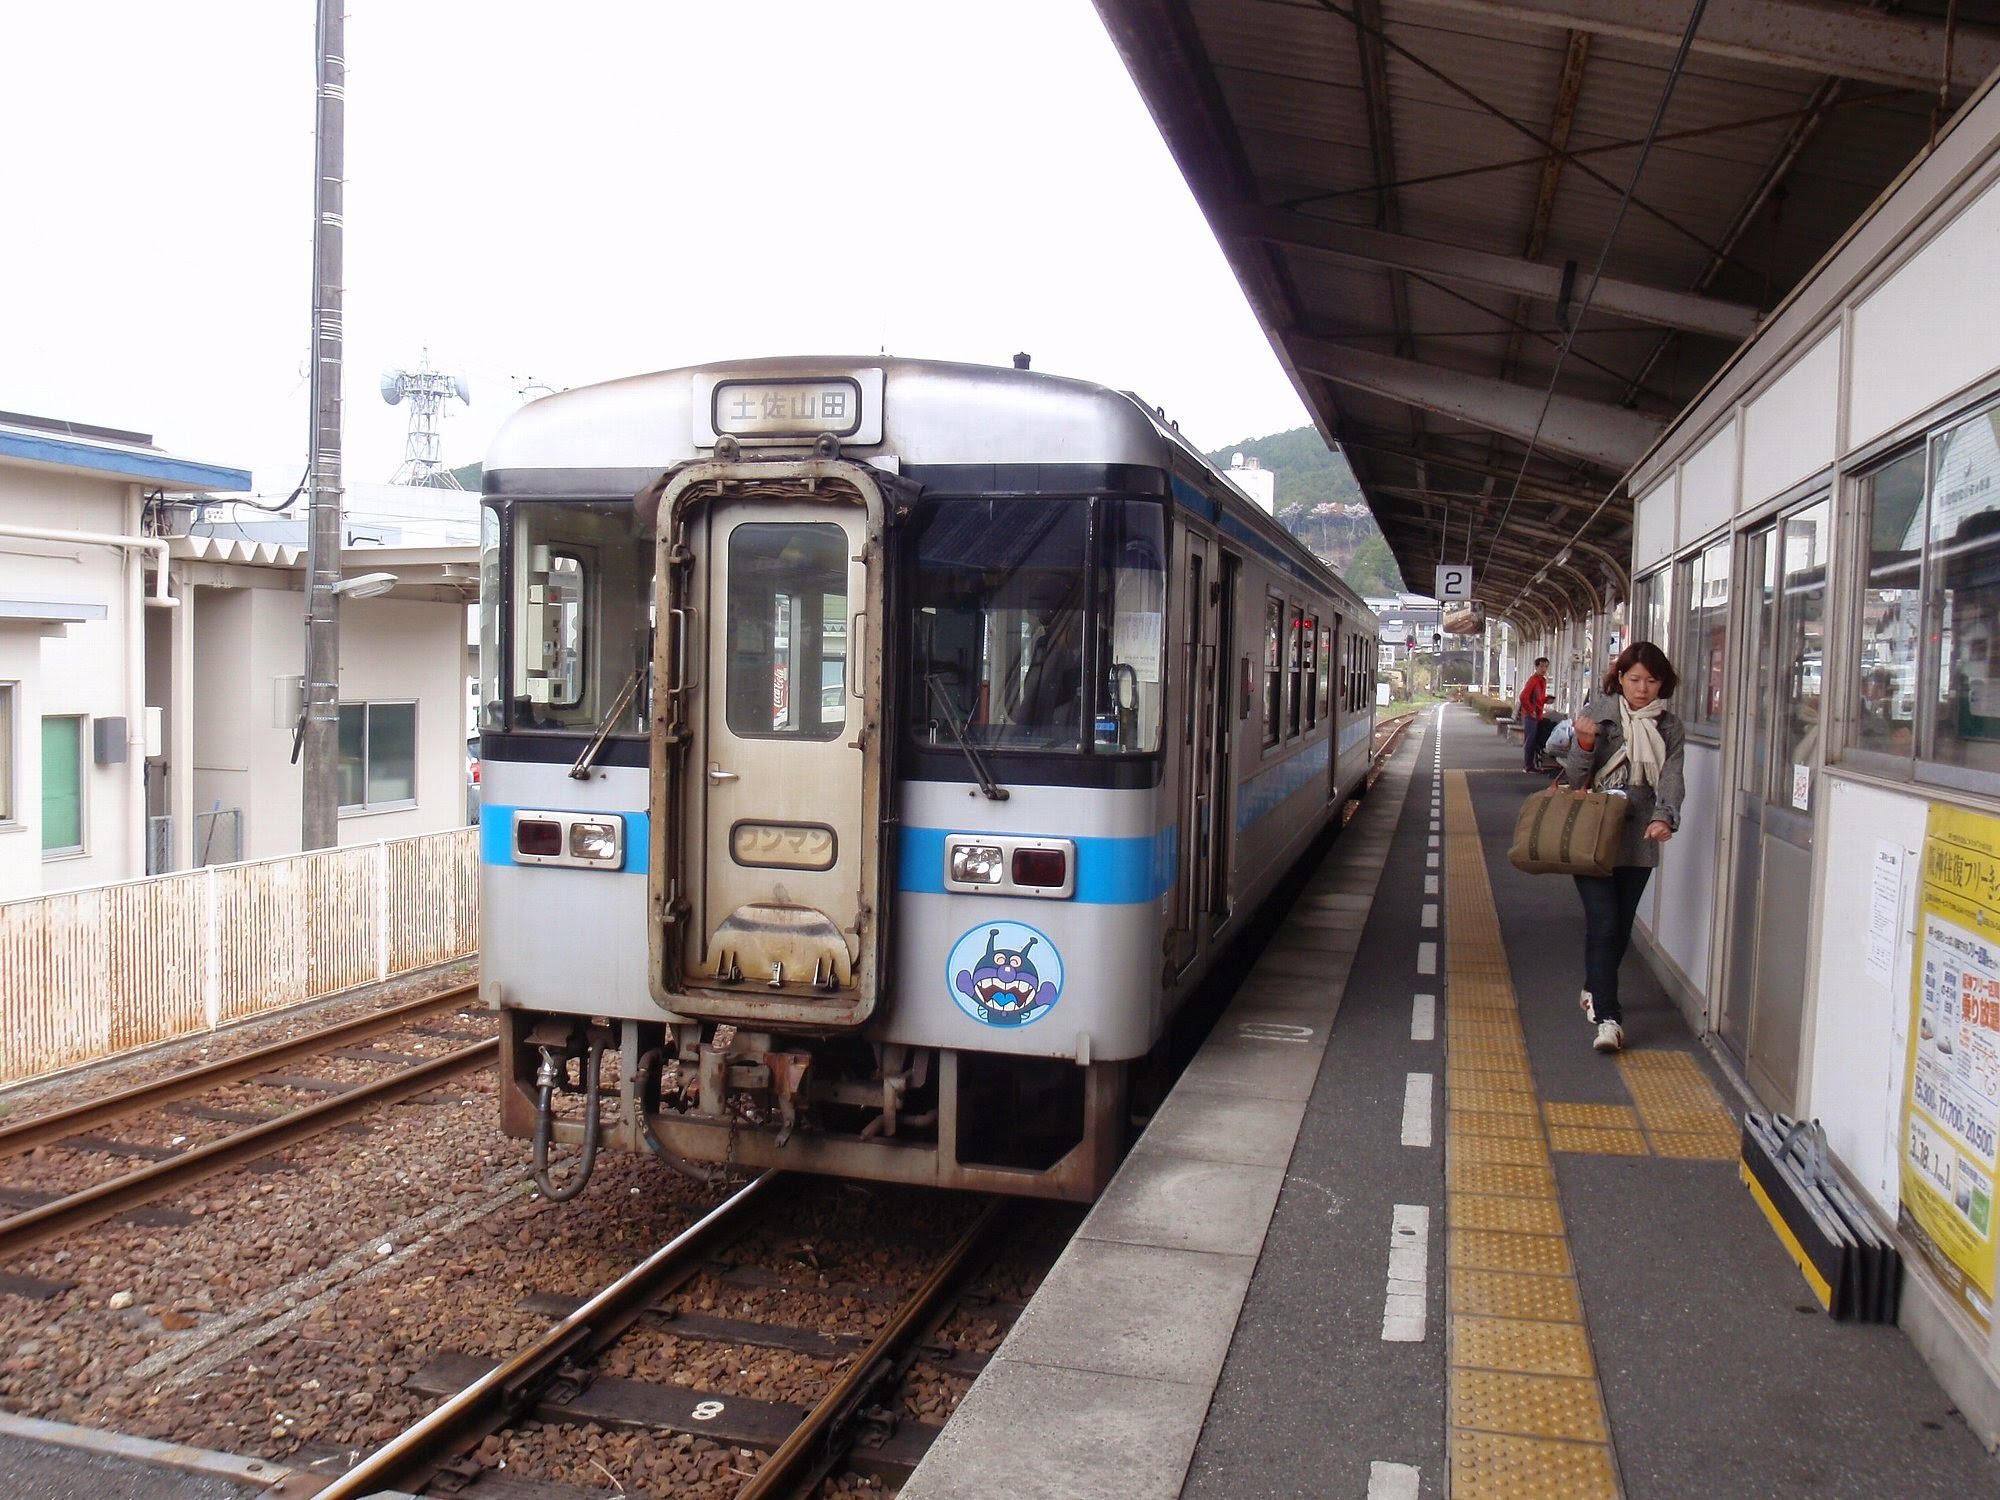 Photo: Kubokawa Station, Kochi  (April 29, 2010) By Kzaral via flickr (CC BY 2.0) https://www.flickr.com/photos/kzaral/4562664657/  ★画像使用記事 『祭りの準備』 http://inagara.octsky.net/maturino-junbi